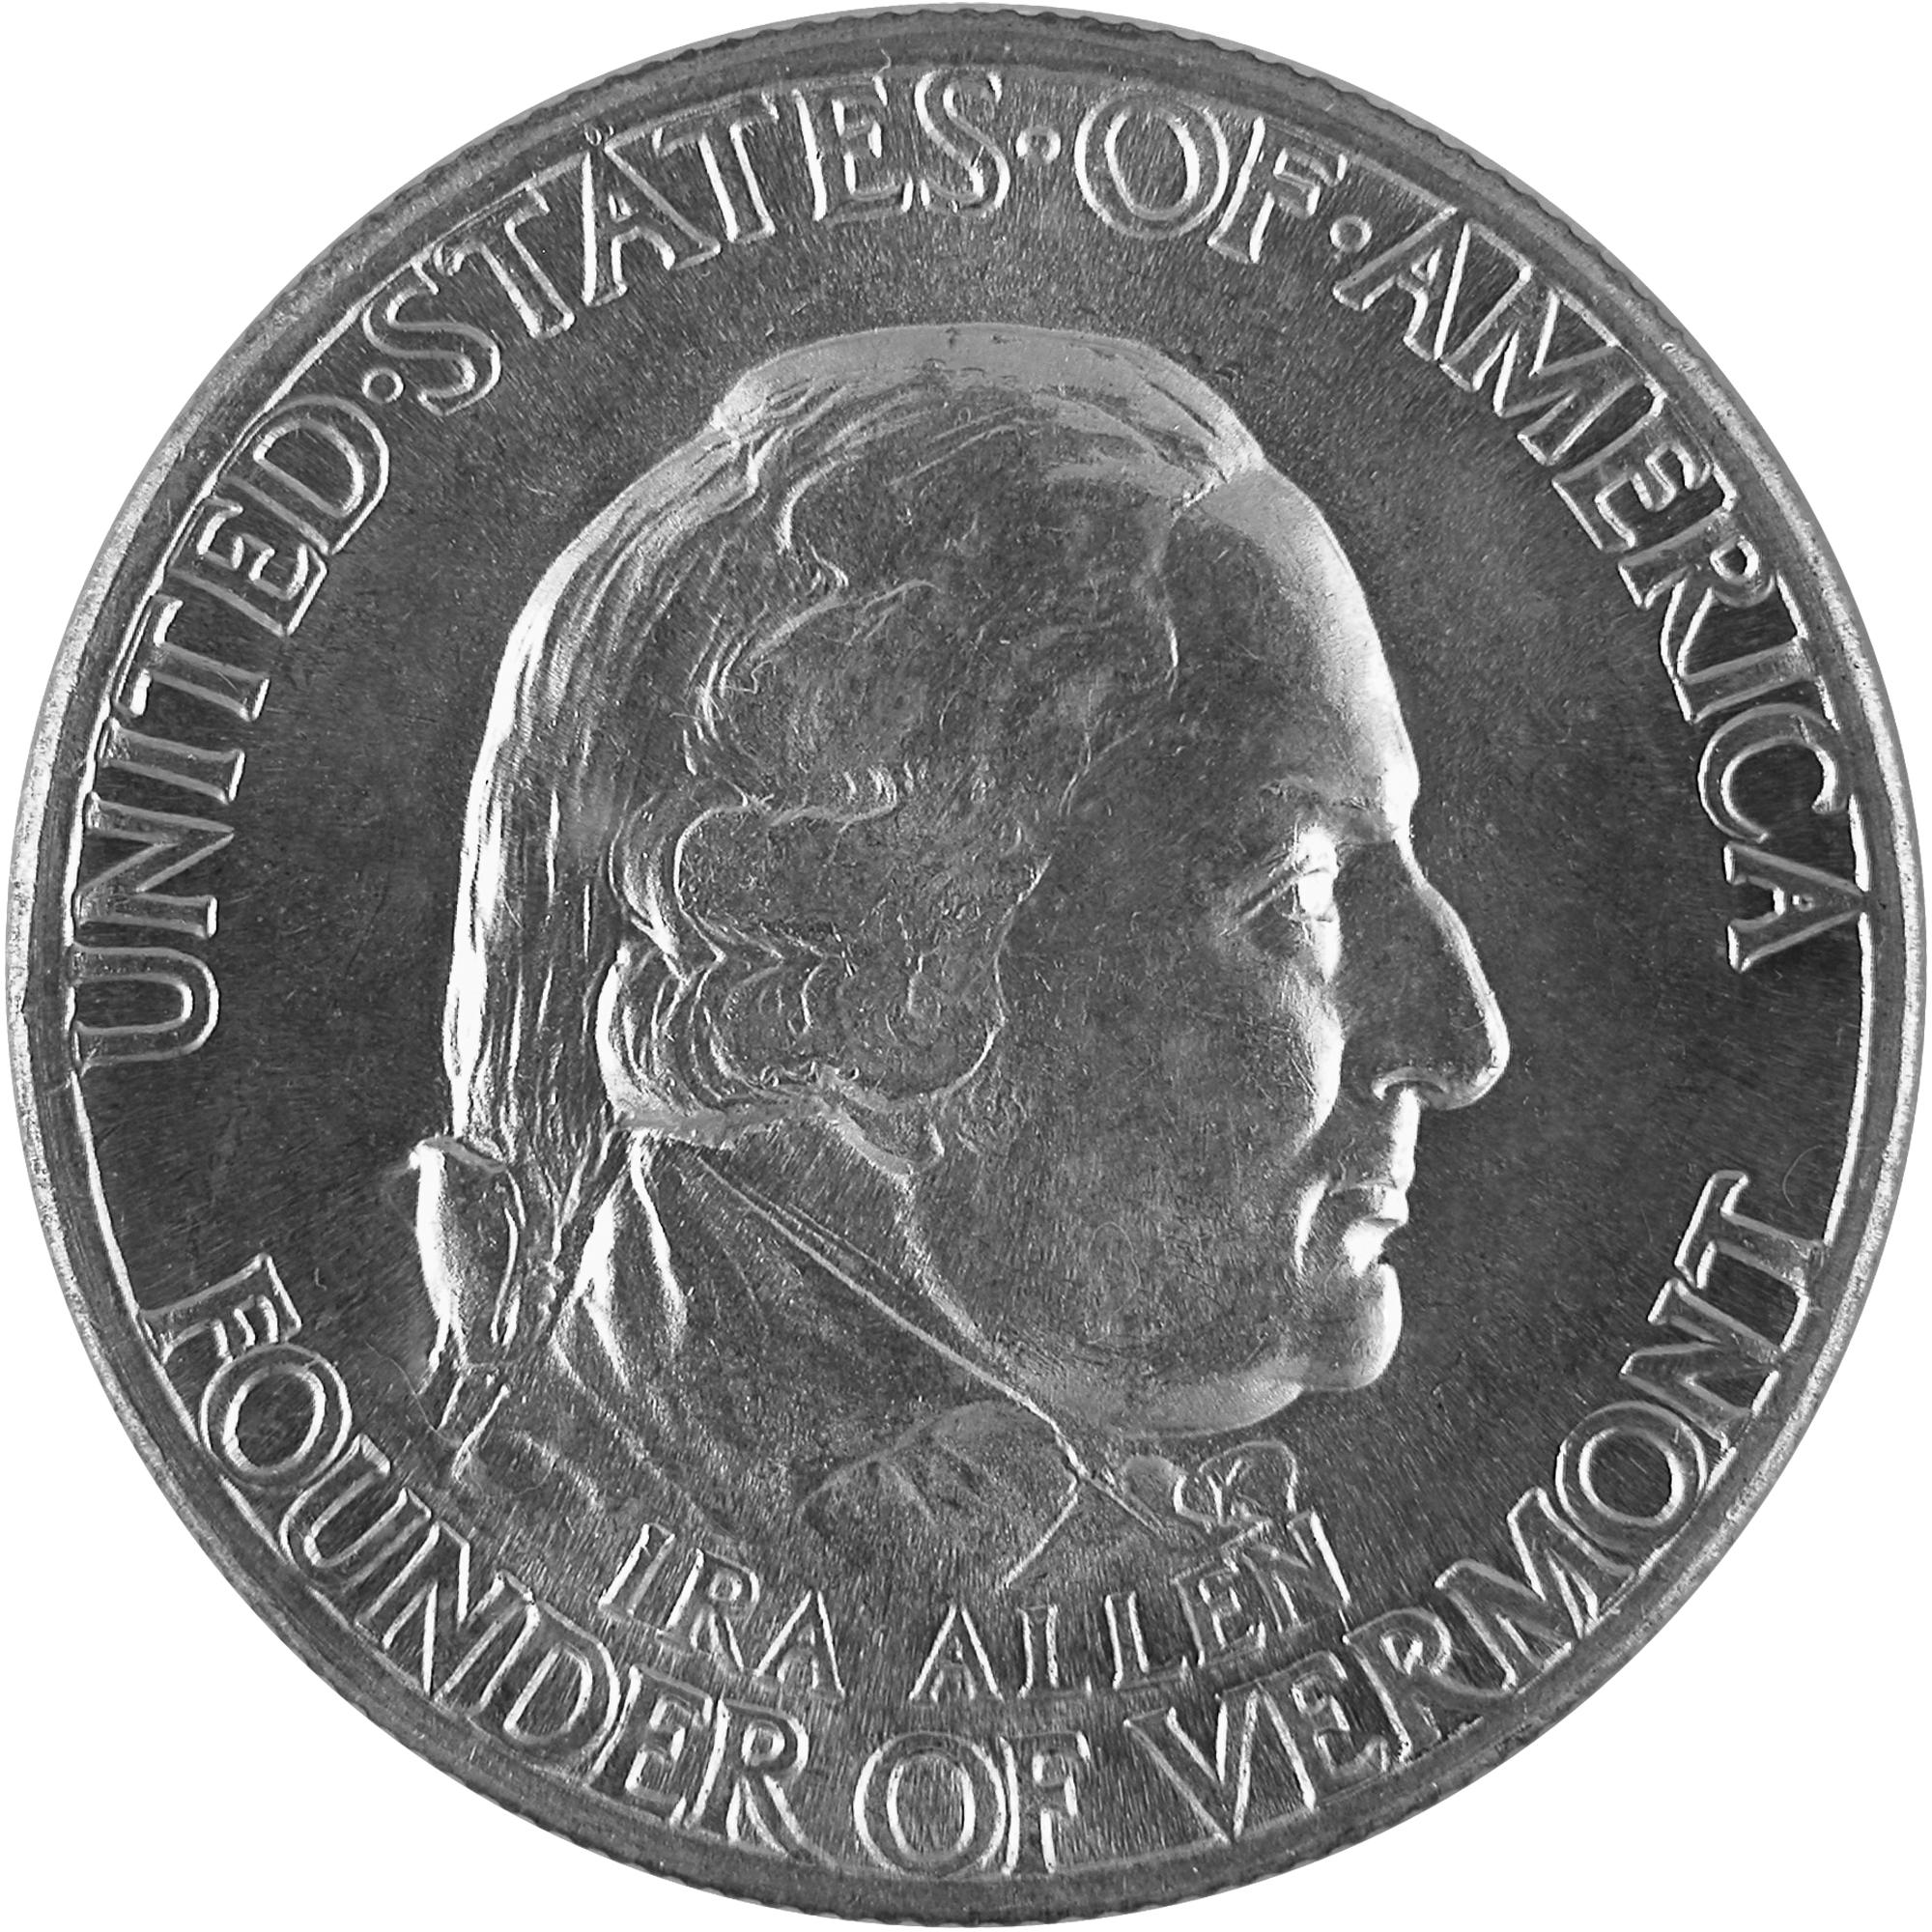 1927 Vermont Sesquicentennial Commemorative Silver Half Dollar Coin Obverse